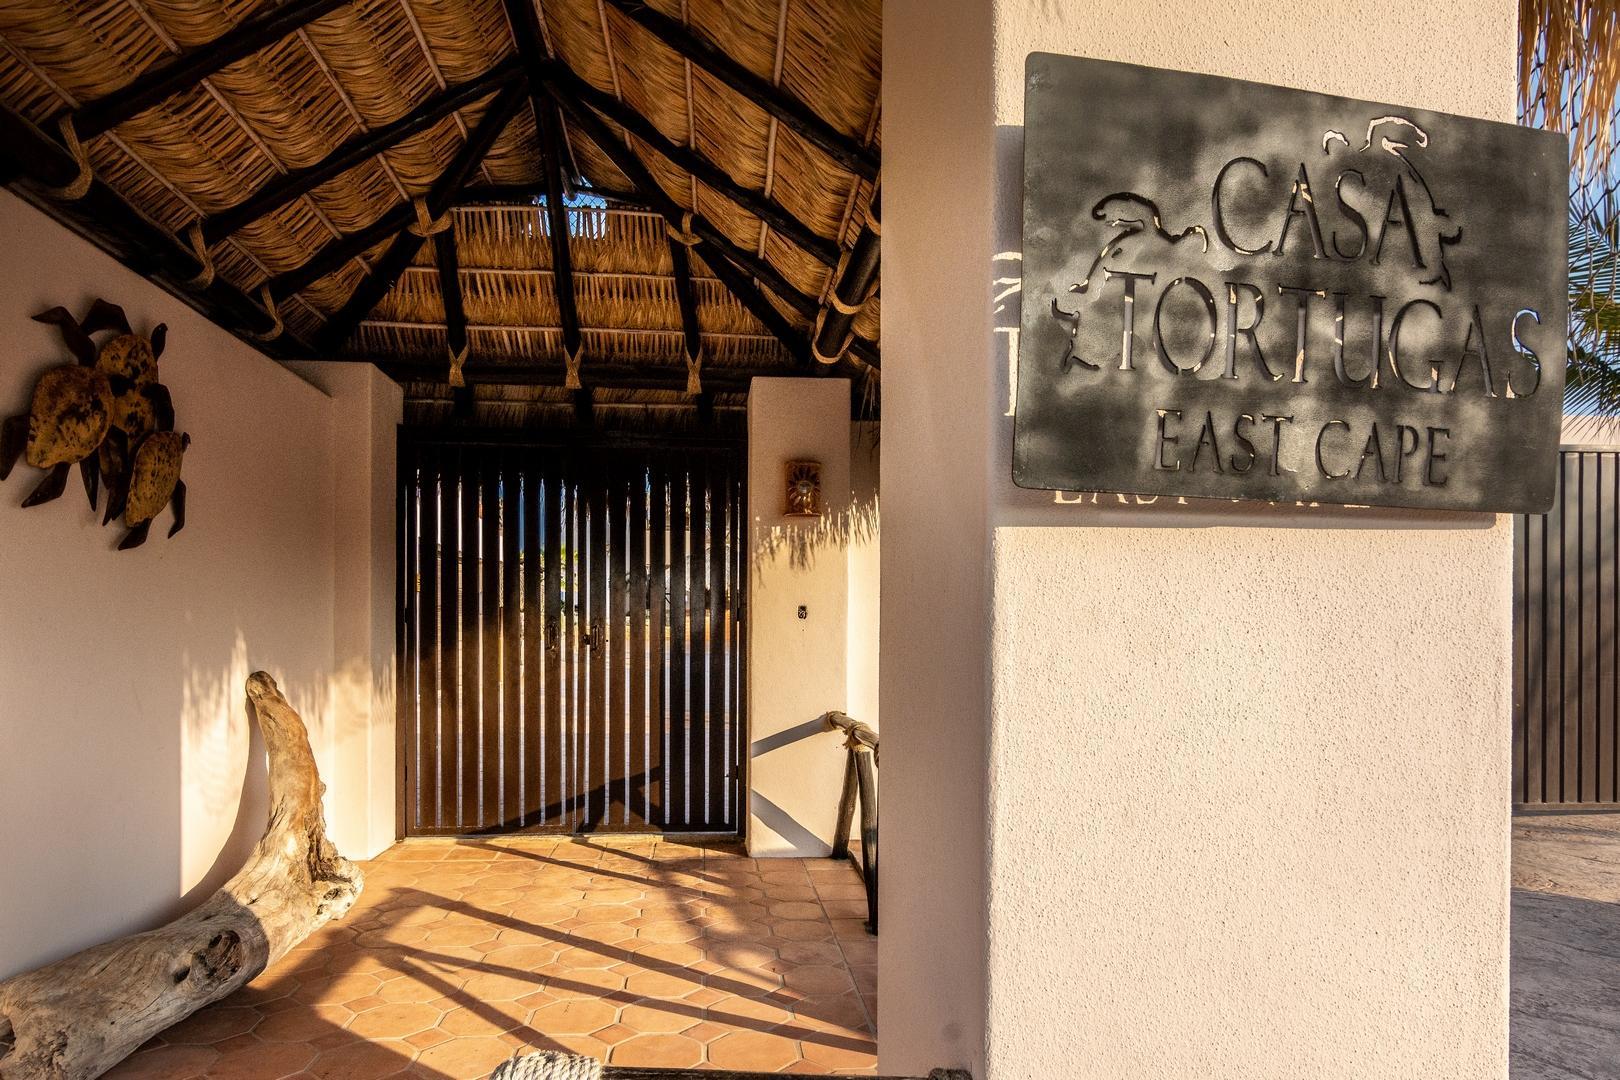 East Cape, 7 Bedrooms Bedrooms, ,5 BathroomsBathrooms,House,For Sale,Manzana 1, Camino Costero,19-1459